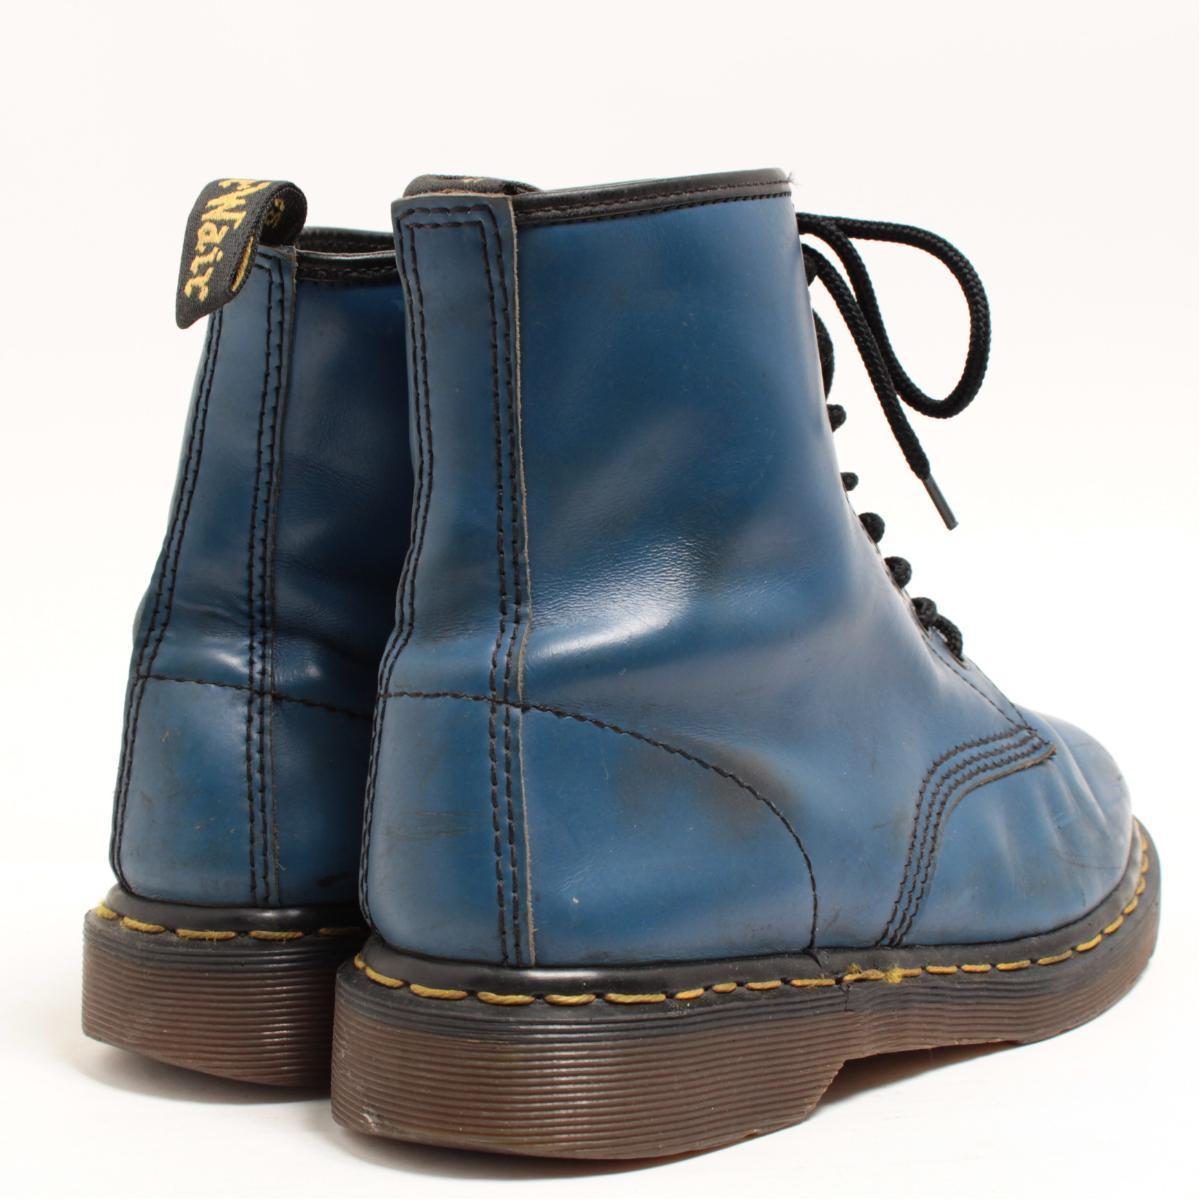 Men 25.5cm /bol7039 made in the doctor Martin Dr.Martens 8 hall boots U.K.